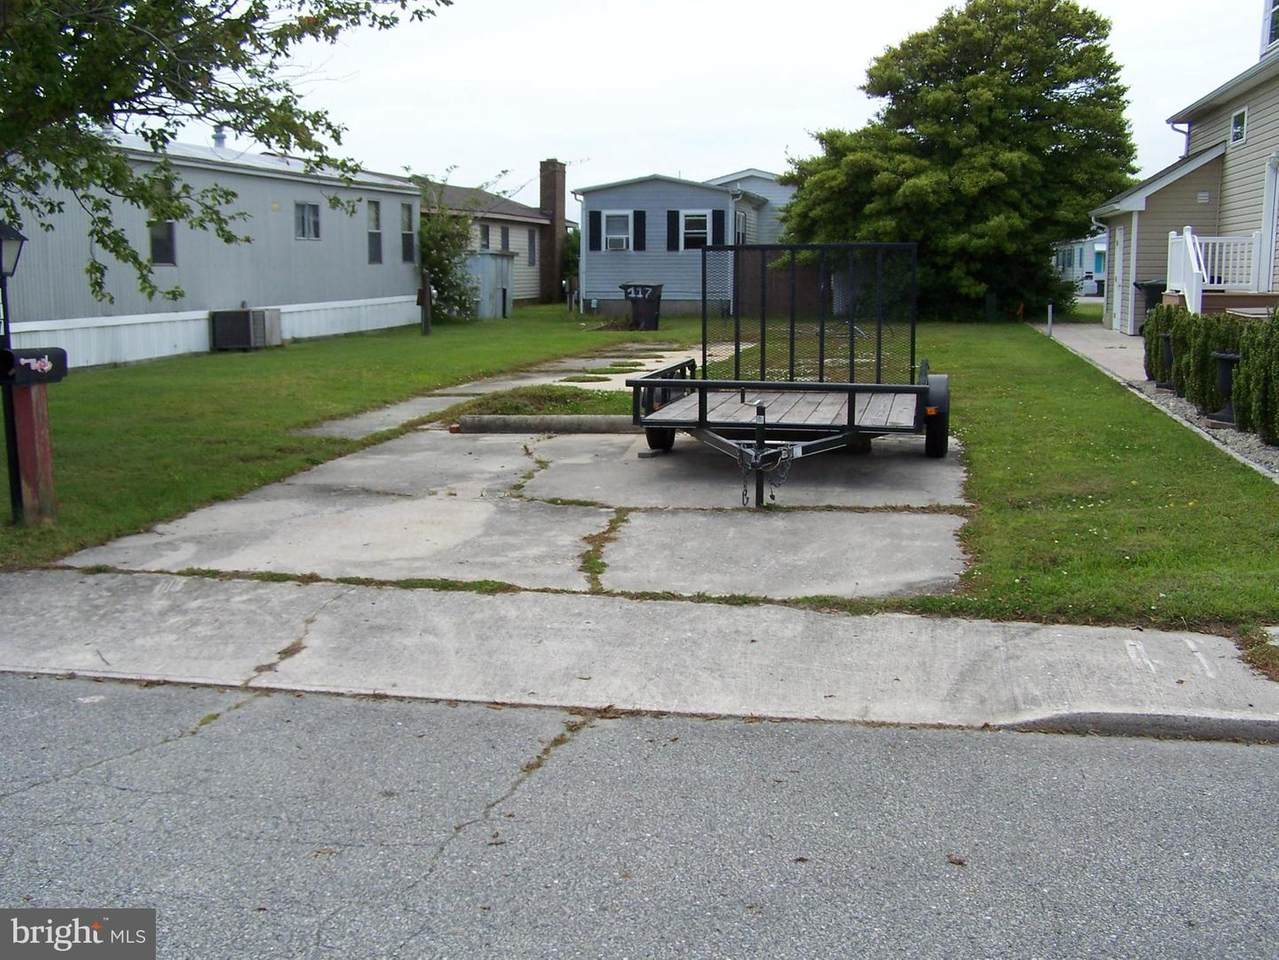 117 Sandyhill Drive - Photo 1